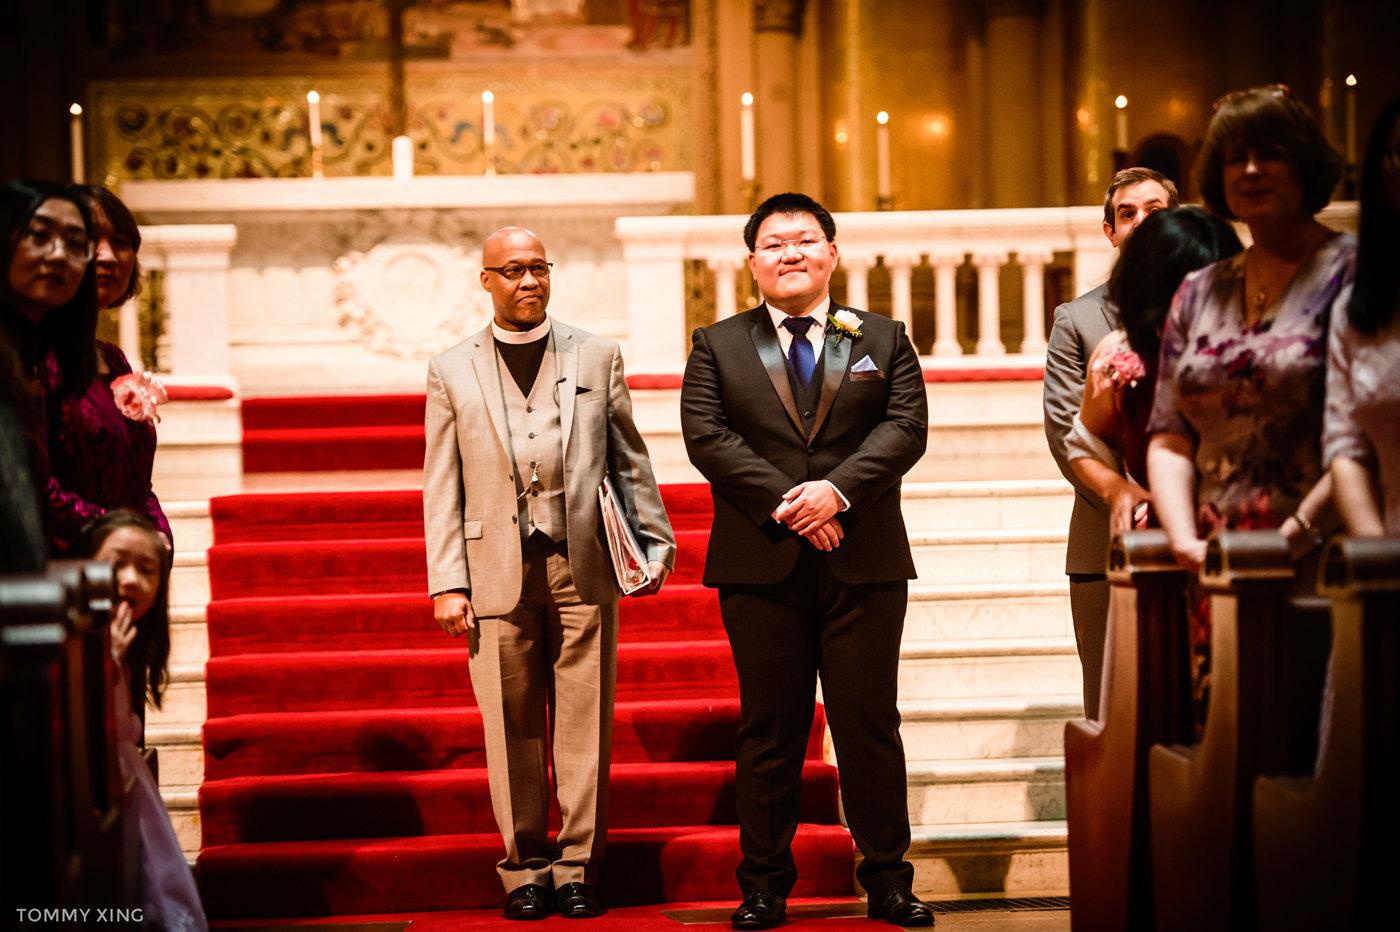 STANFORD MEMORIAL CHURCH WEDDING - Wenjie & Chengcheng - SAN FRANCISCO BAY AREA 斯坦福教堂婚礼跟拍 - 洛杉矶婚礼婚纱照摄影师 Tommy Xing Photography071.jpg